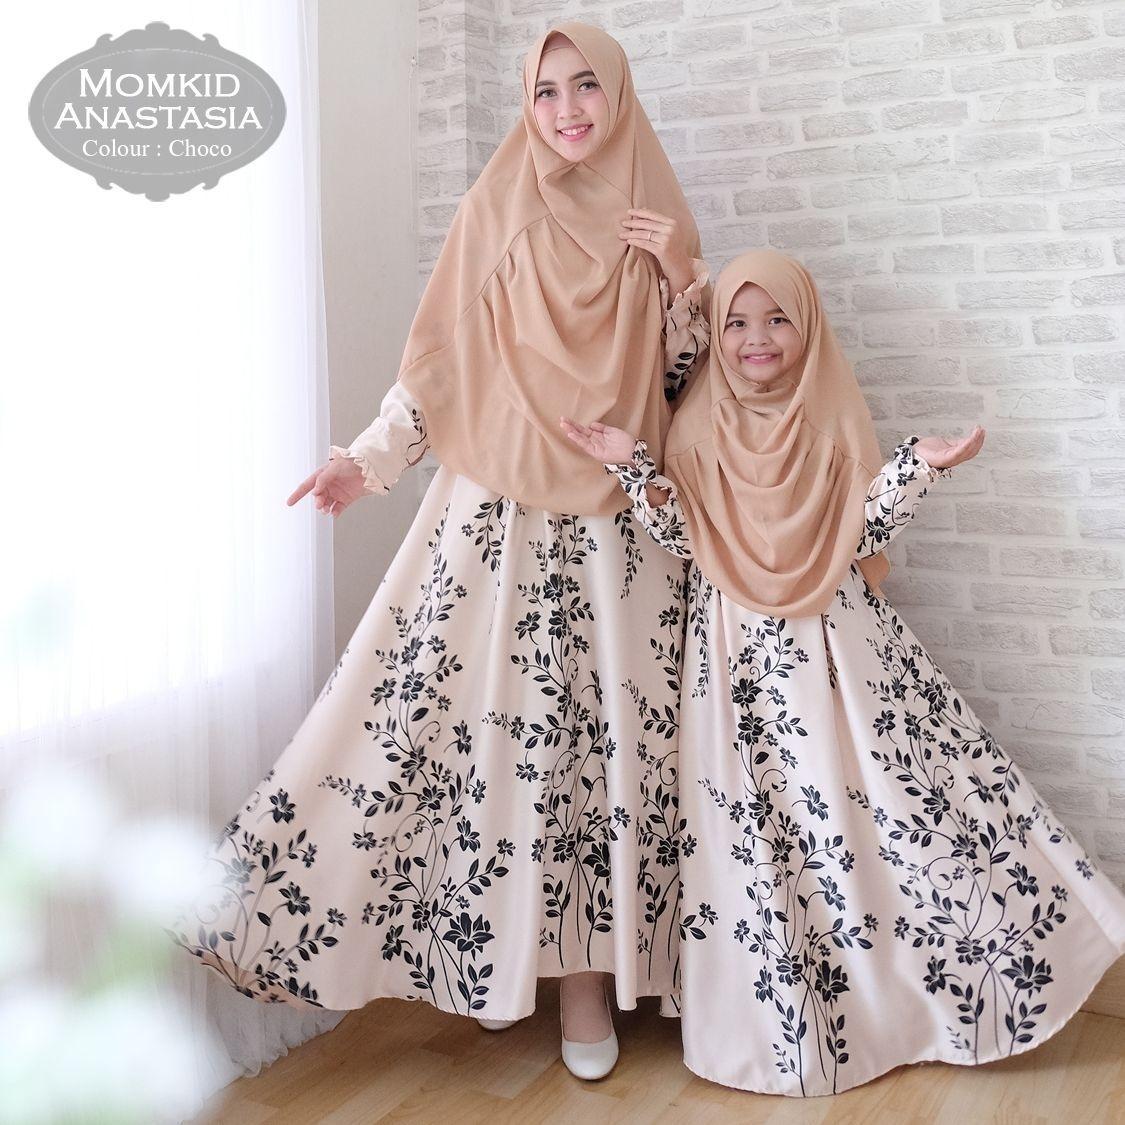 Key&kay88 gamis muslim syar'i maxmara anastasia ibu dan anak couple